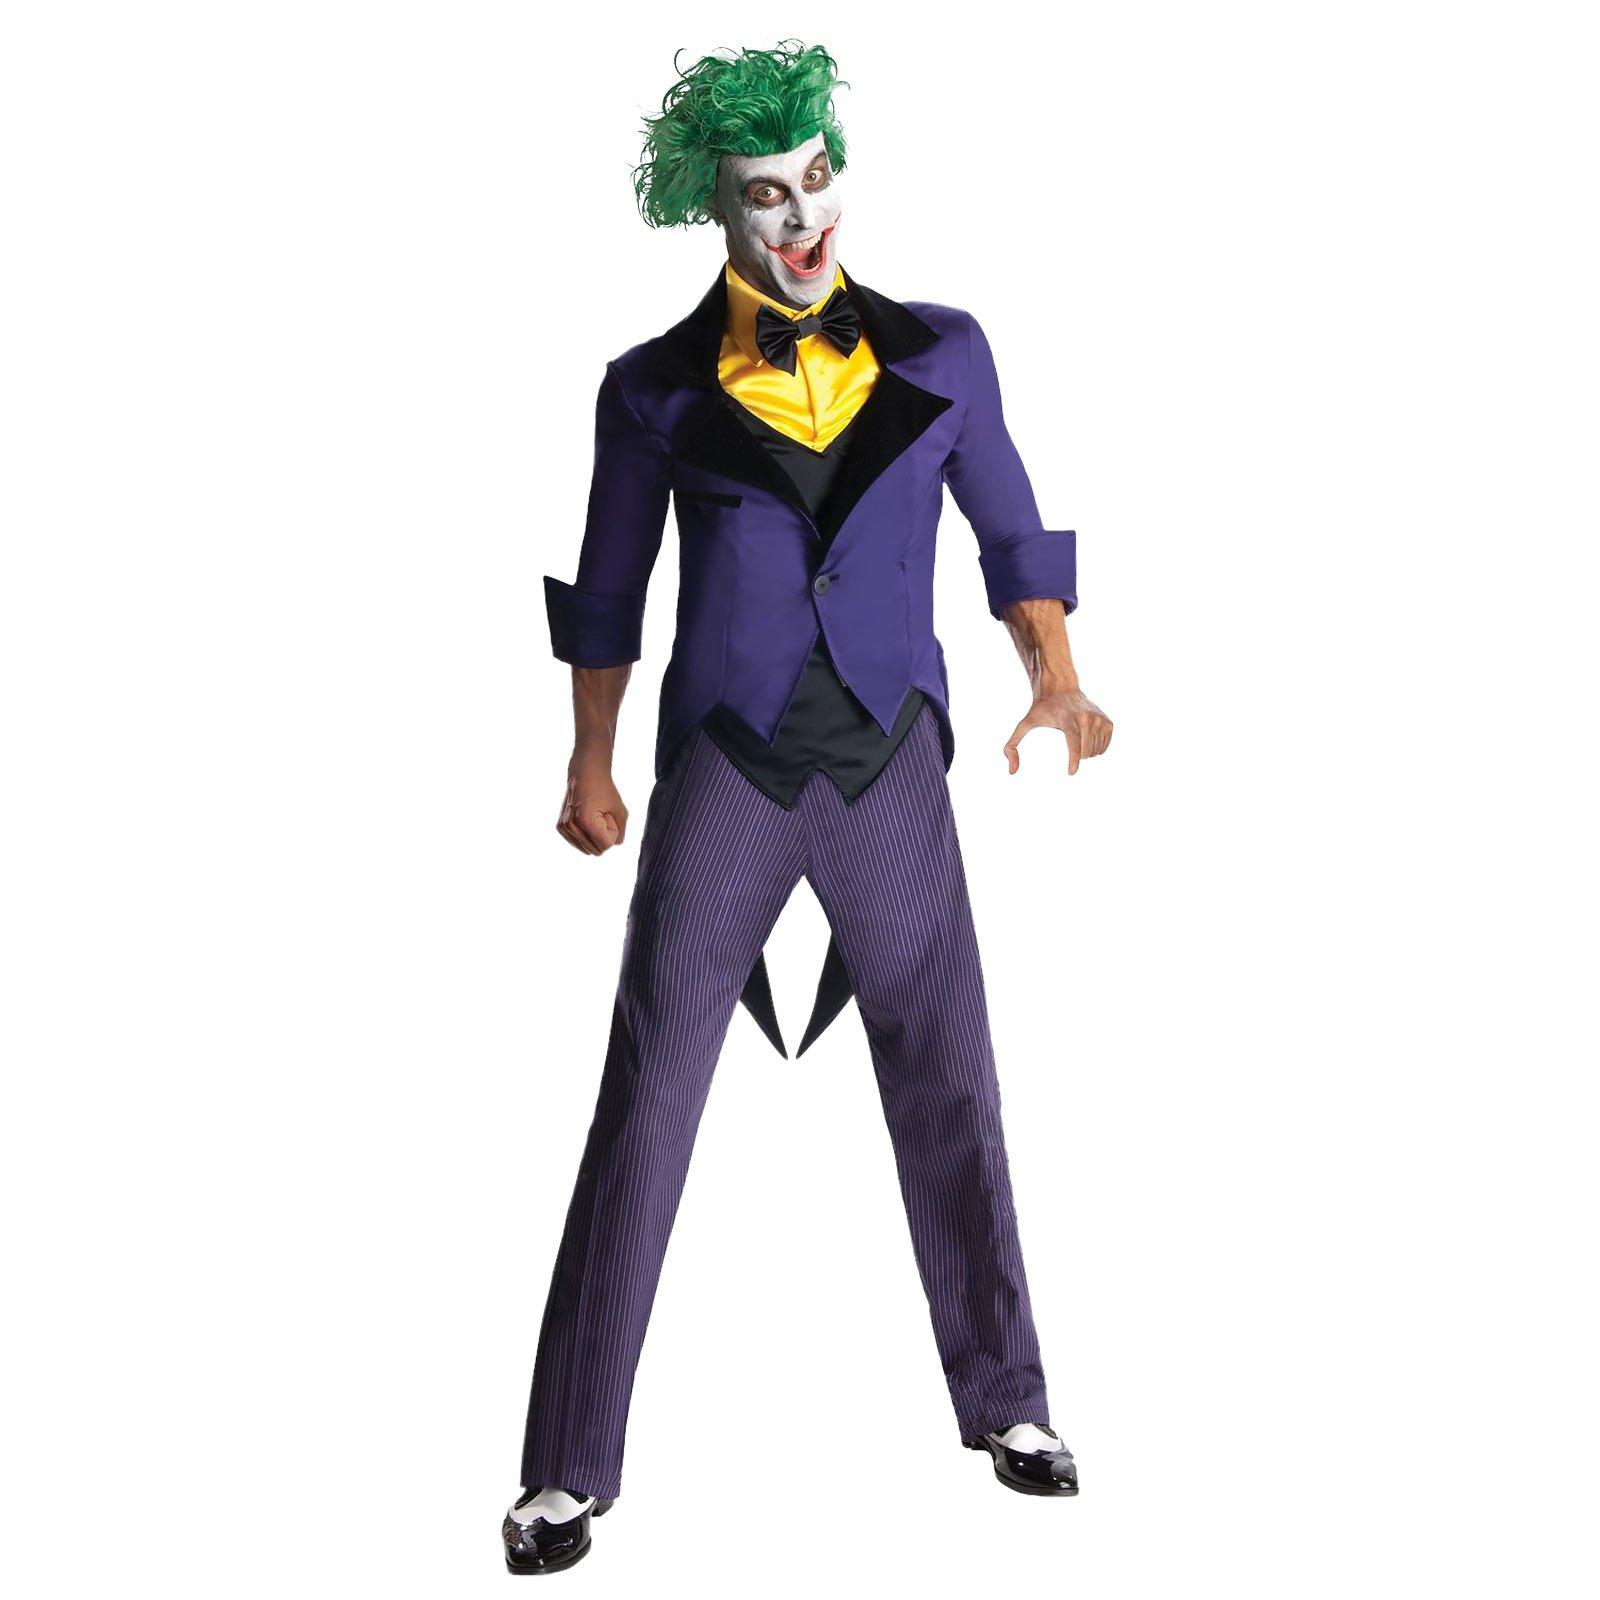 Joker Kostüm Batman Gotham City Most Wanted 2-TLG DC Comics Herren Kostüm Jacke Hose - XL